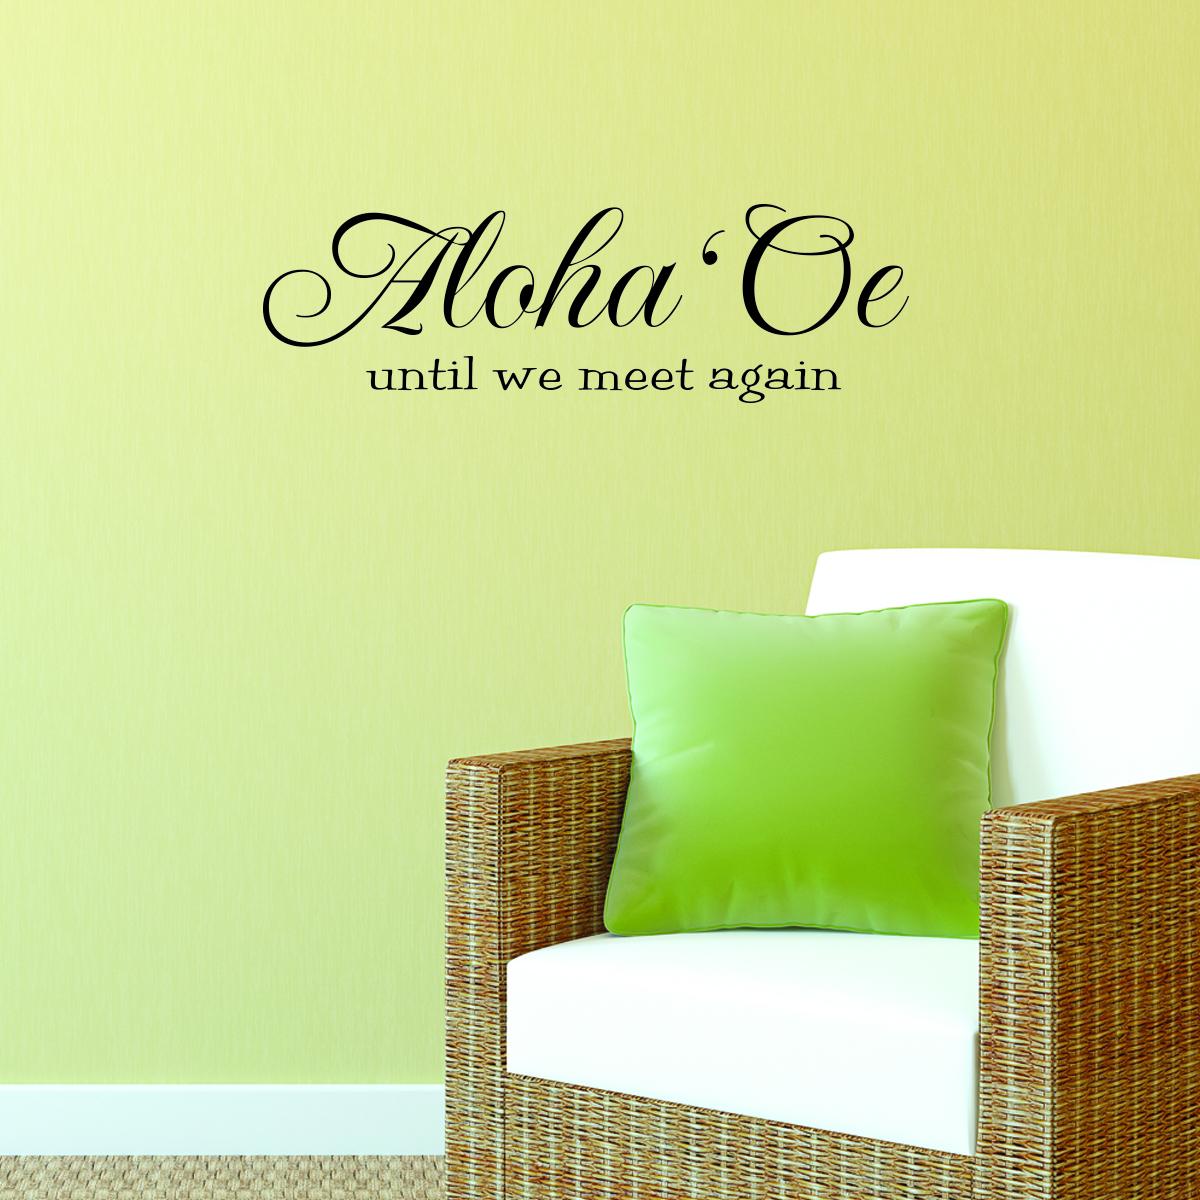 Aloha \'Oe Wall Quotes™ Decal   WallQuotes.com